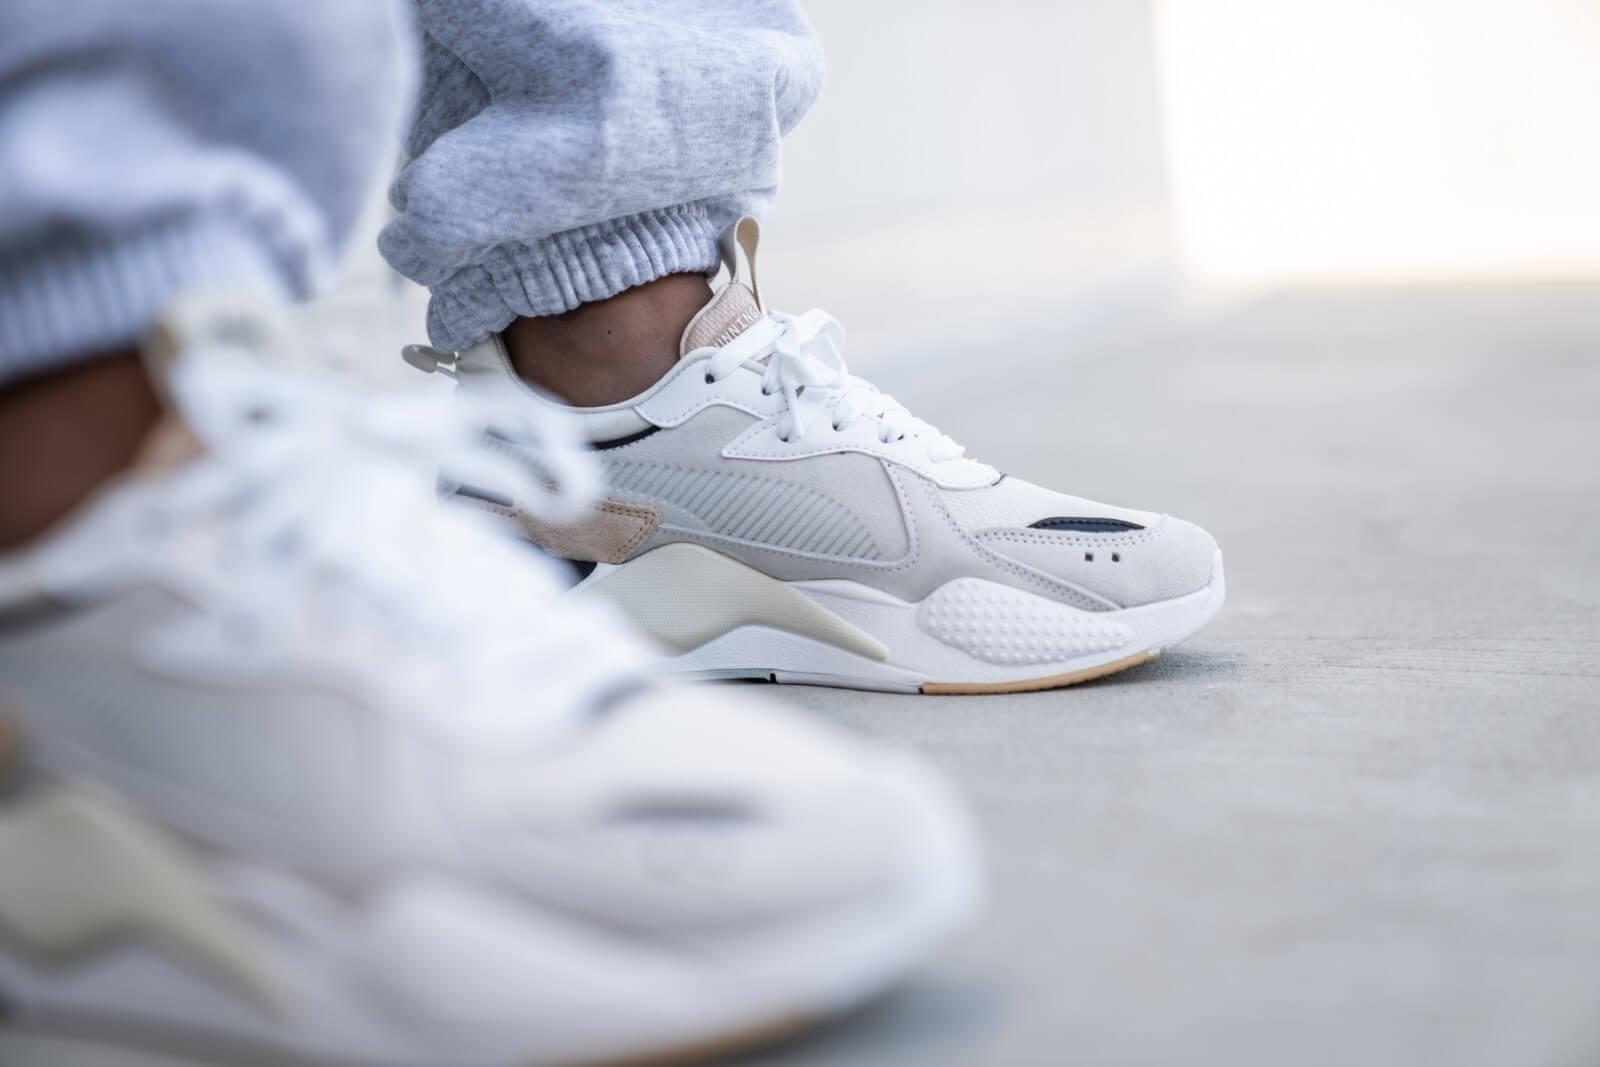 Puma Rs-X Reinvent Kadın Siyah Spor Ayakkabı 371008 | Occasion